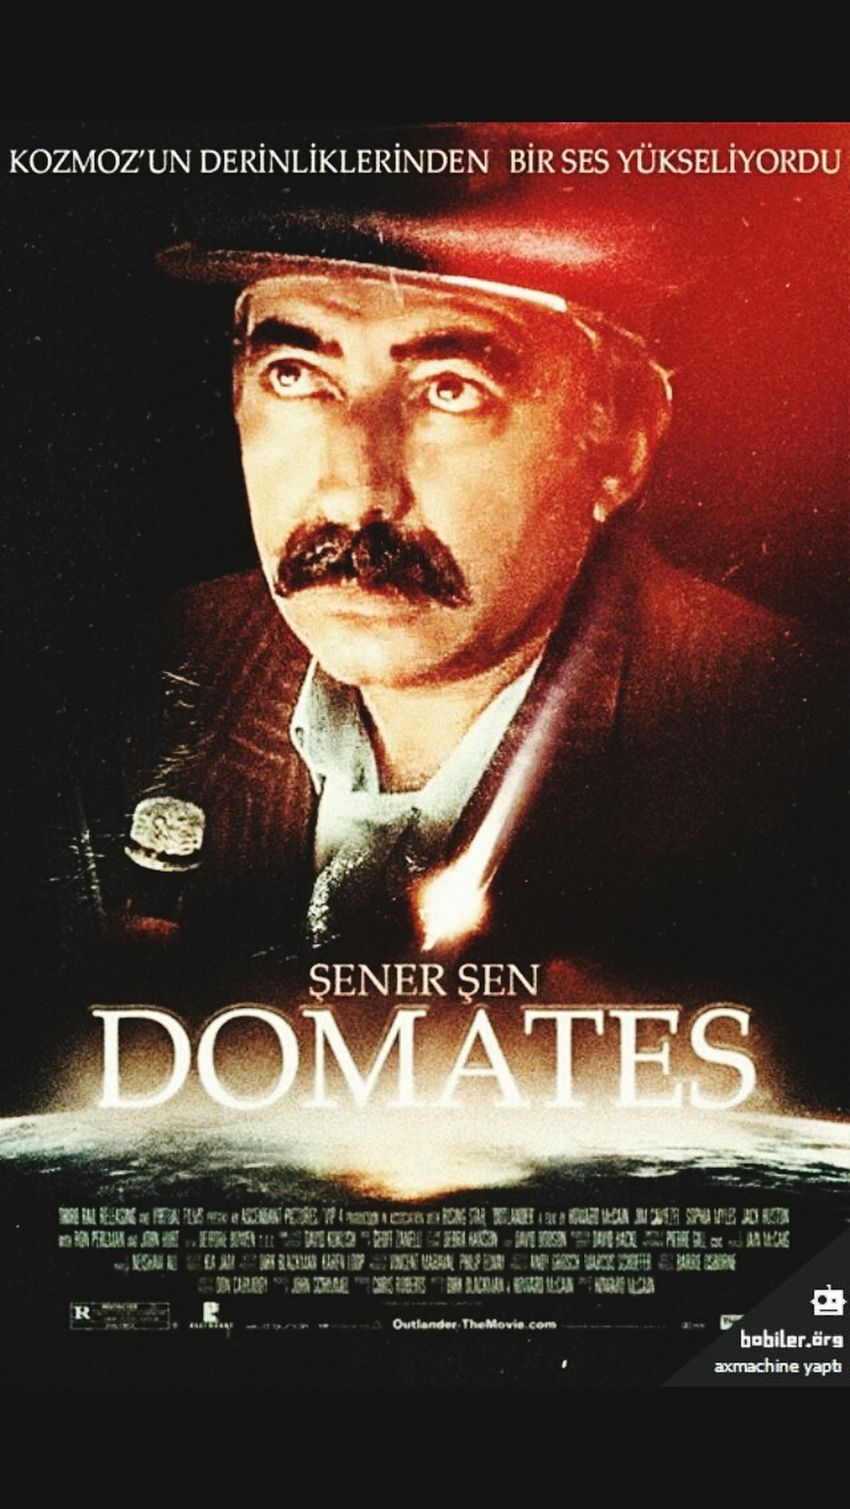 şener şen Domates Cokguldum Büyükustad Yeşilçam  Movieposter Poster